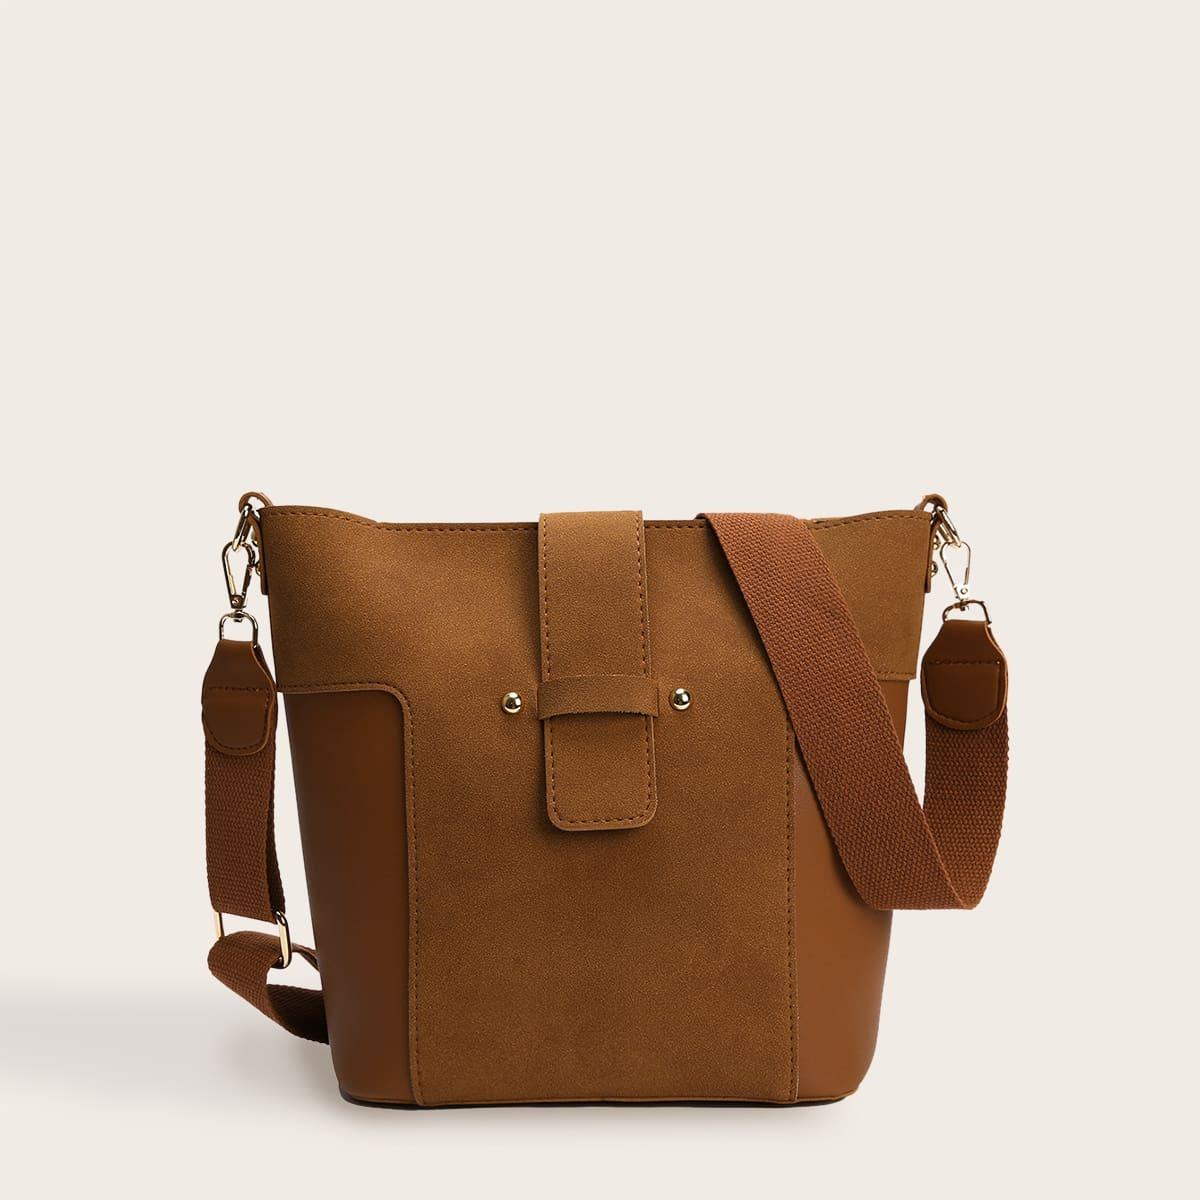 2pcs Minimalist Crossbody Bag With Inner Pouch